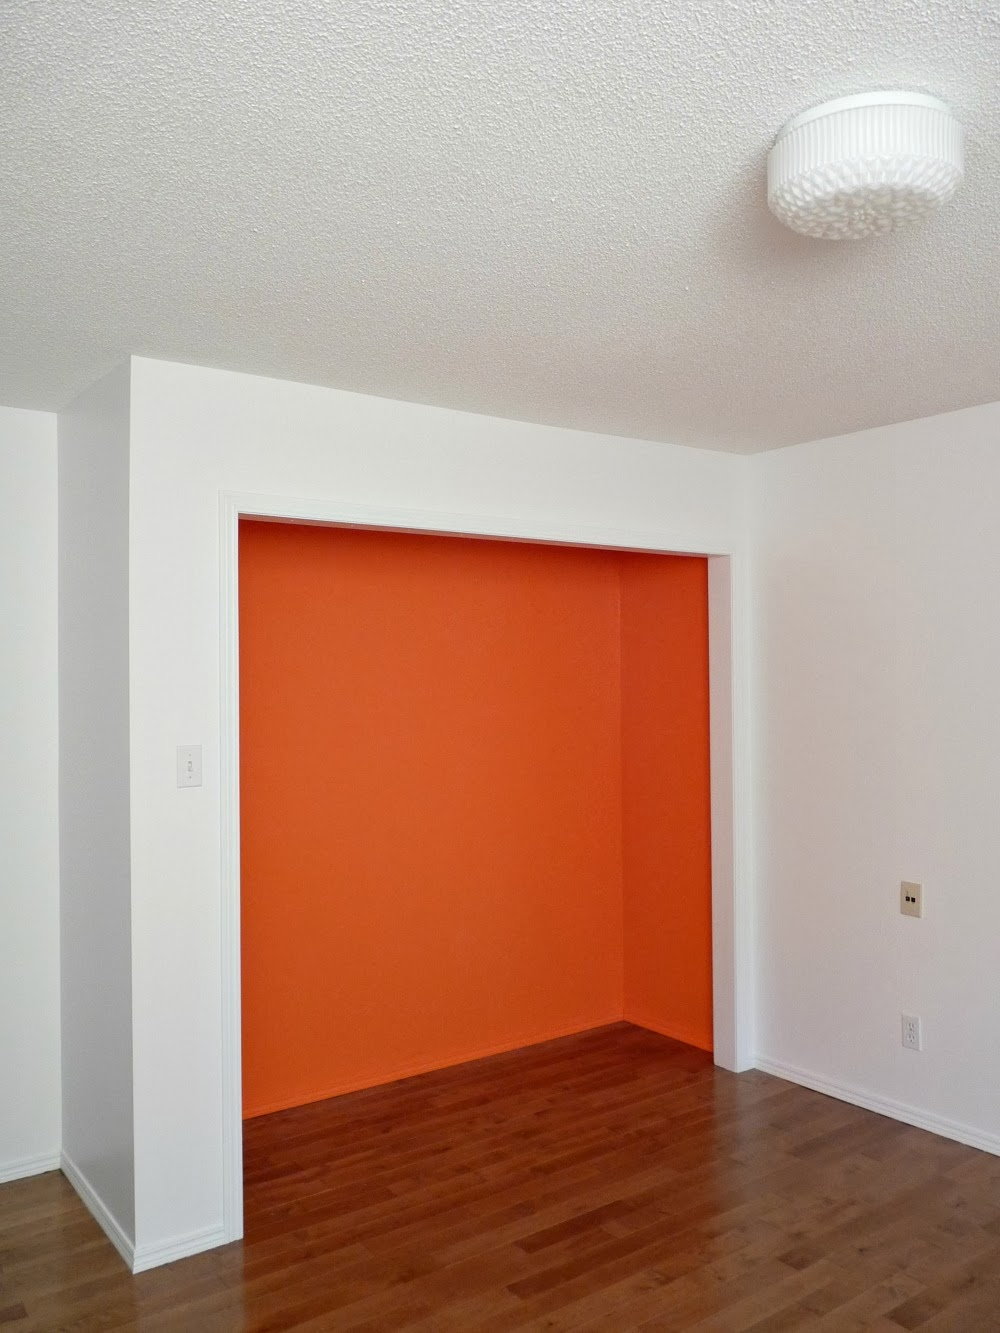 Closet painted orange inside